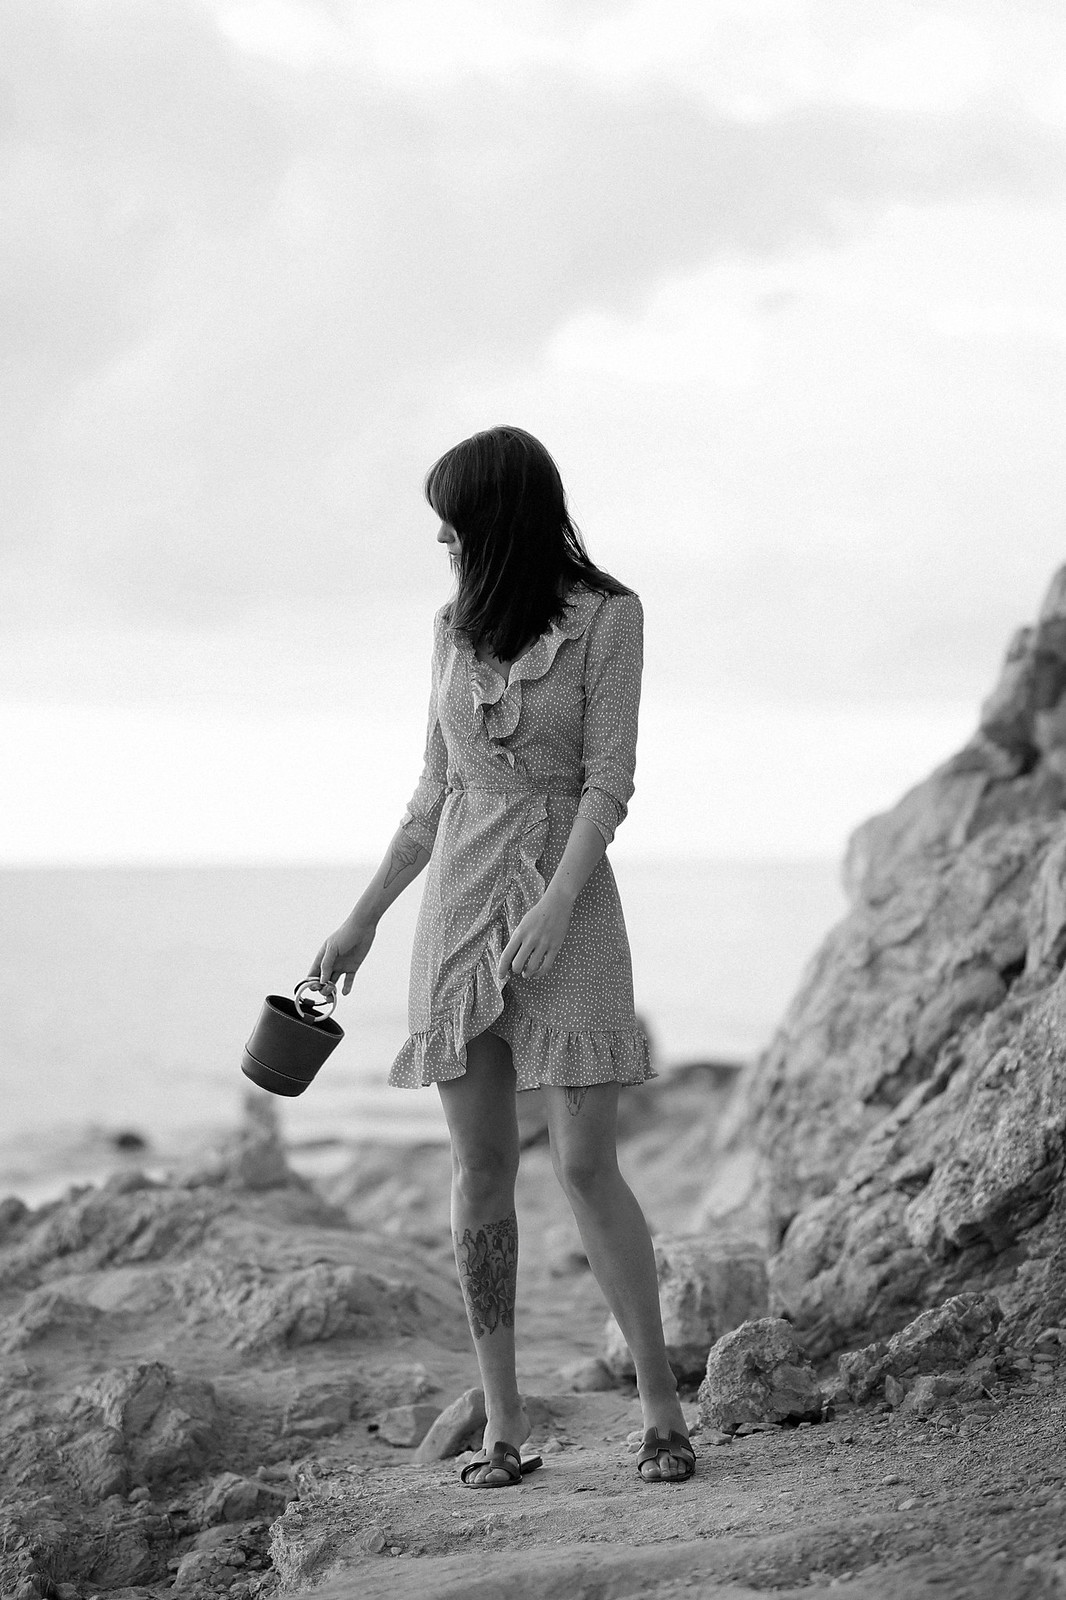 vila yellow mustard polka dot dress mallorca holiday beach sunrise moody style fashionblogger cats & dogs modeblog ricarda schernus fotograf max bechmann düsseldorf travelbloggers roamers 1